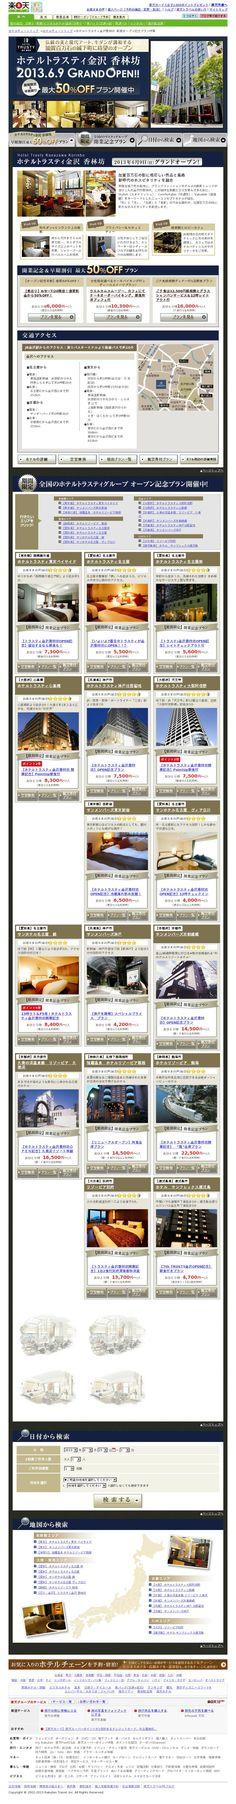 【D】【PKG】トラスティ金沢香林坊 新規オープン特集<2013/05/20>